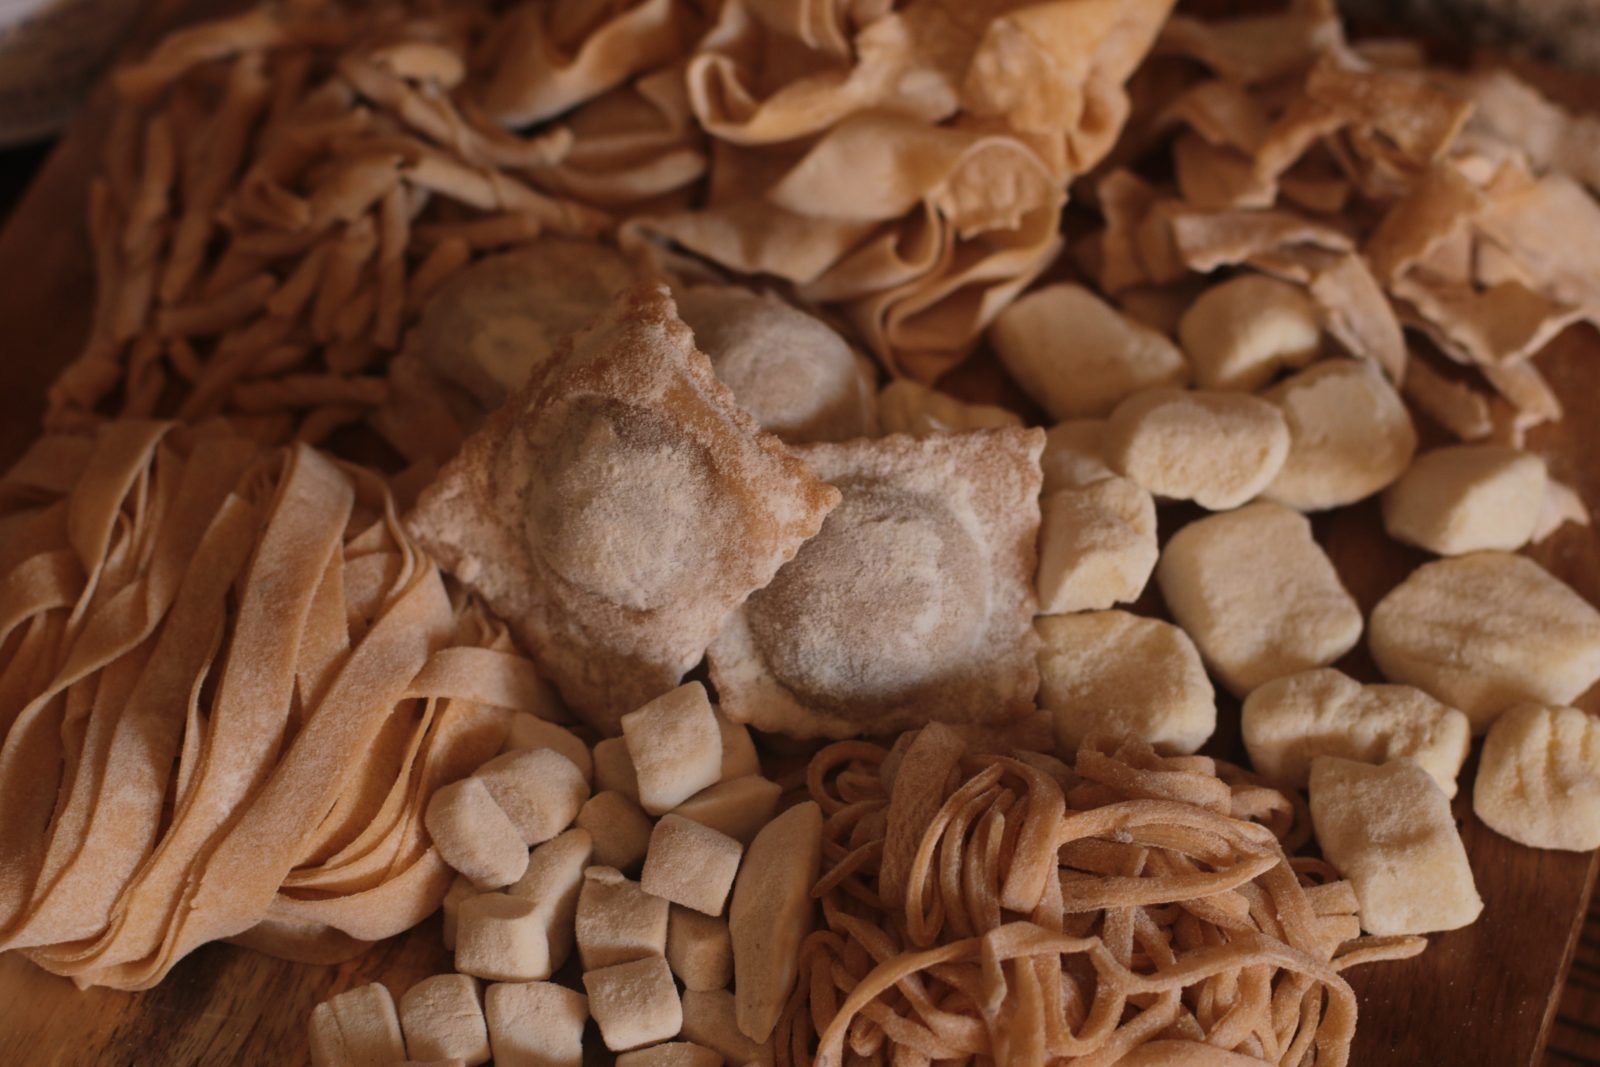 fresh homemade pasta and more